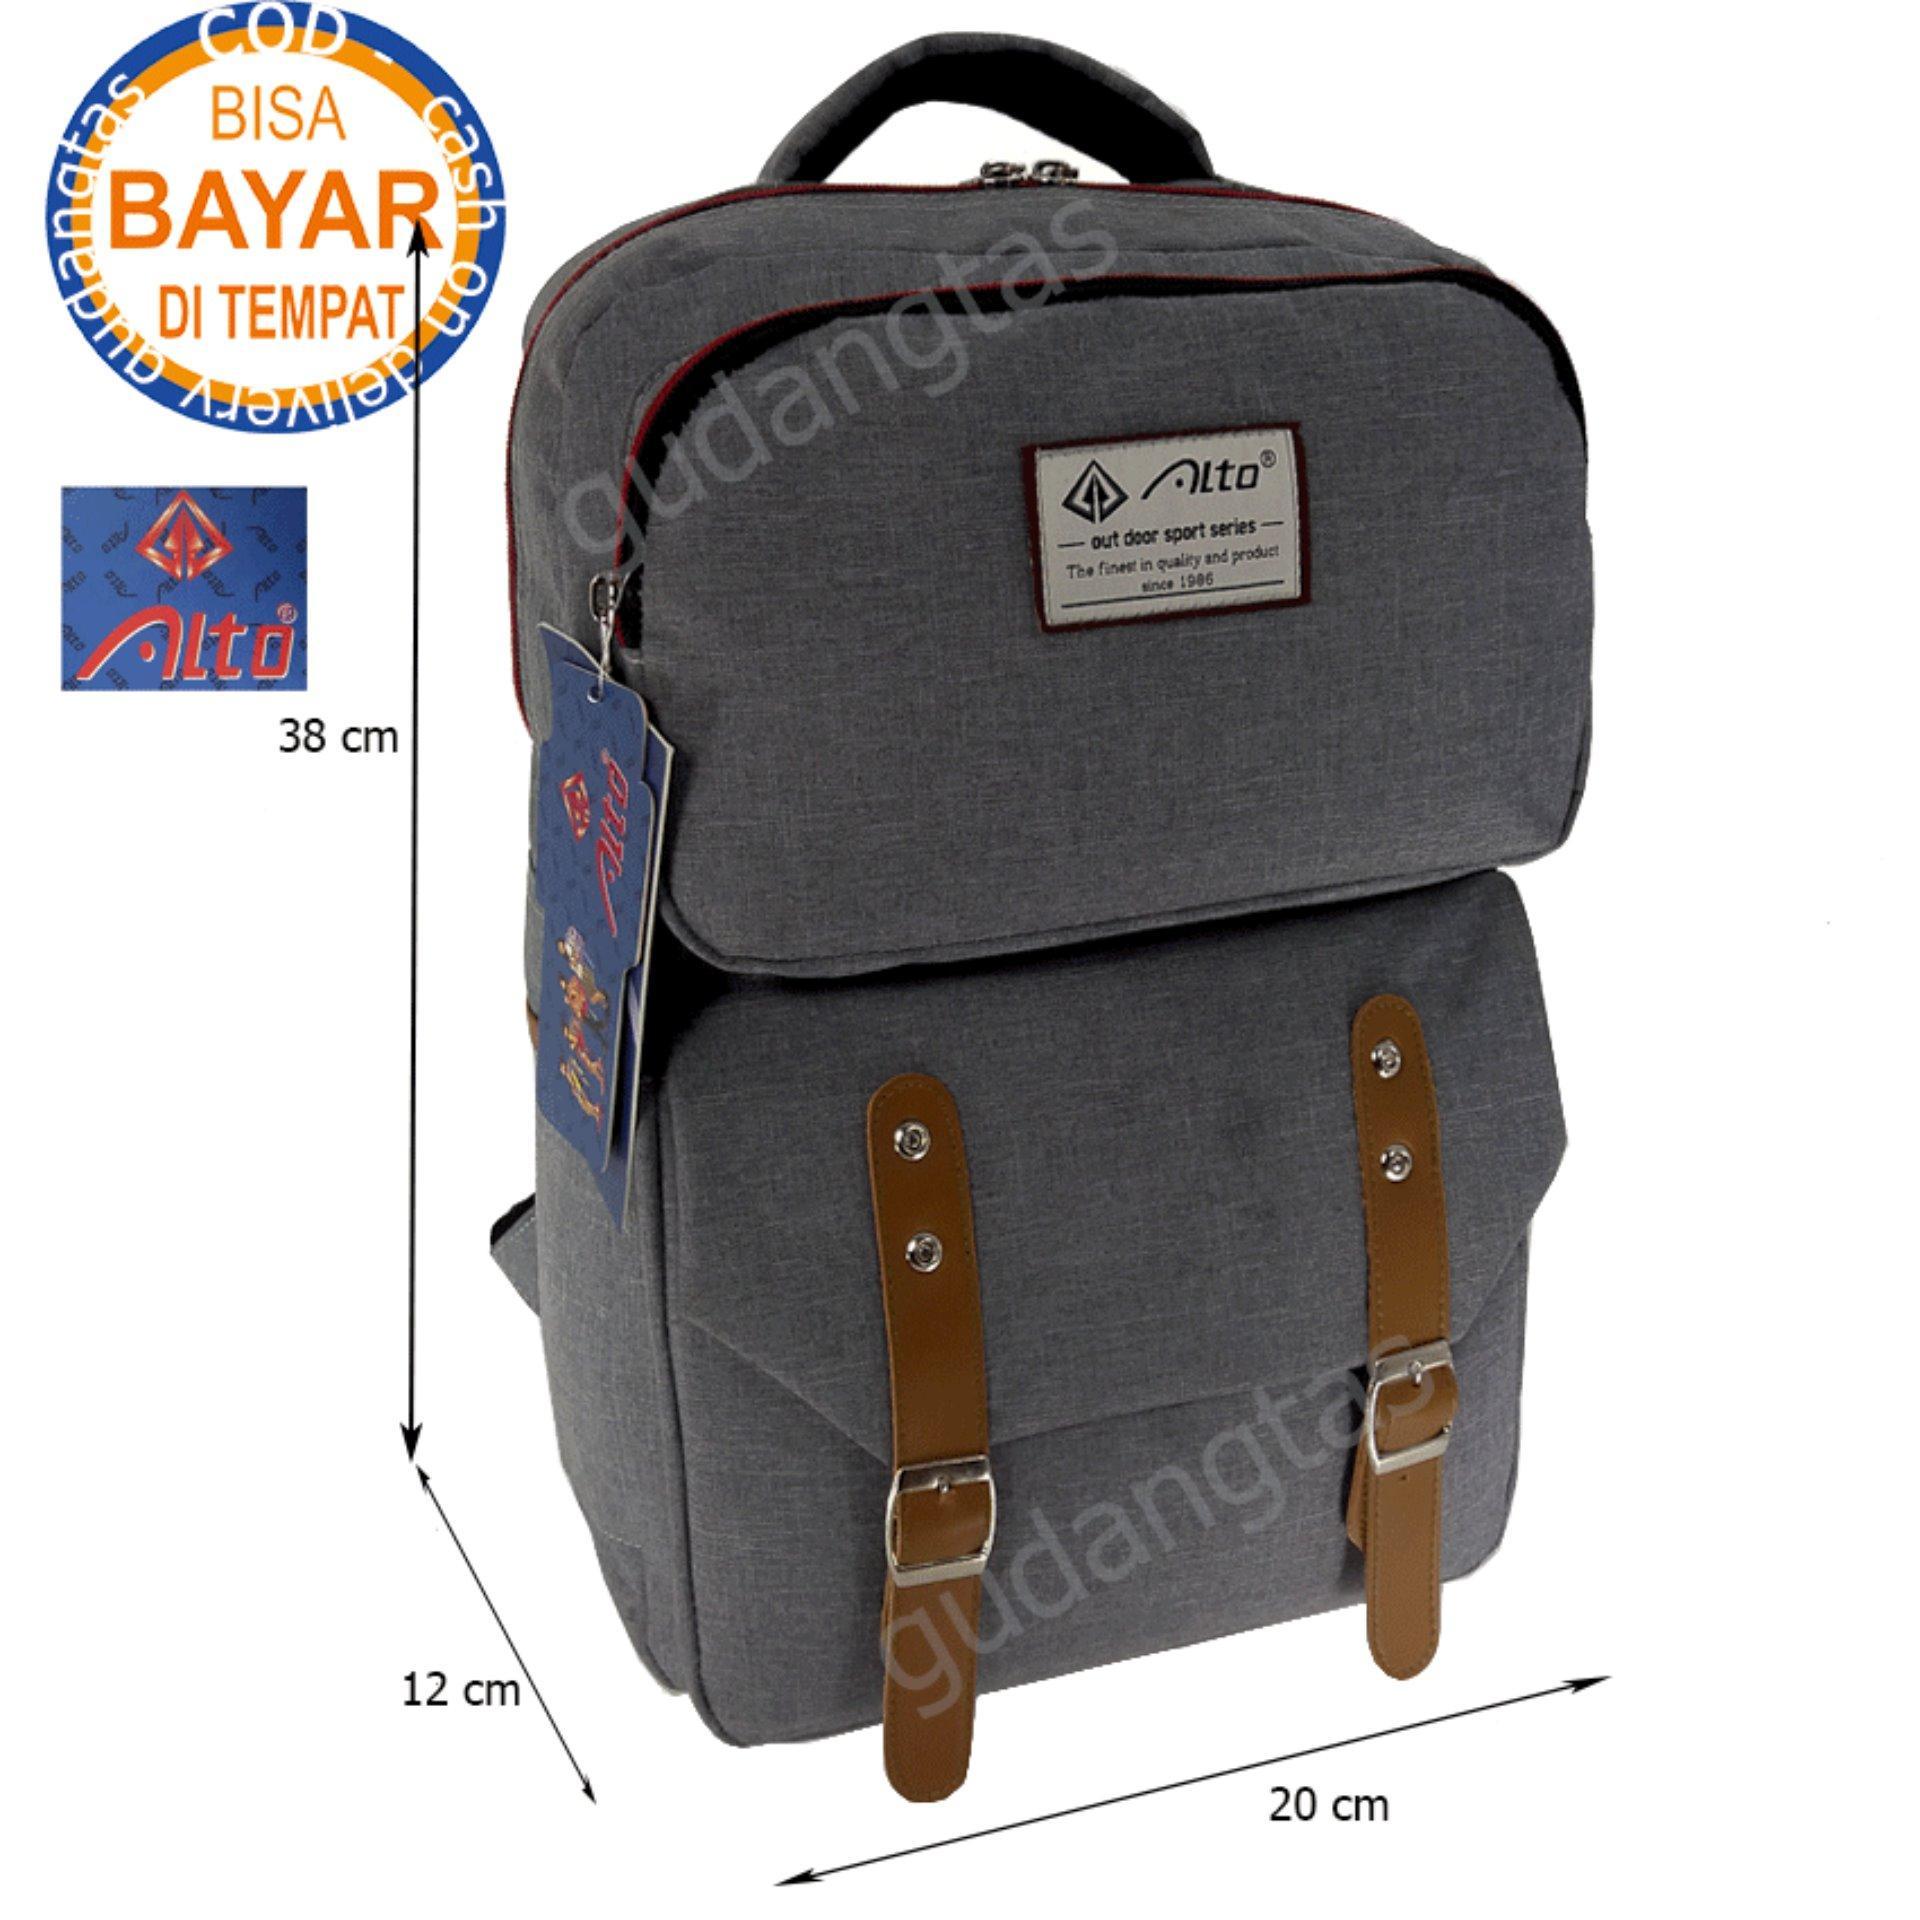 Alto Tas Backpack Kanvas / Sekolah / Remaja / Ransel Kuliah / Korean Bag 78251 – Grey